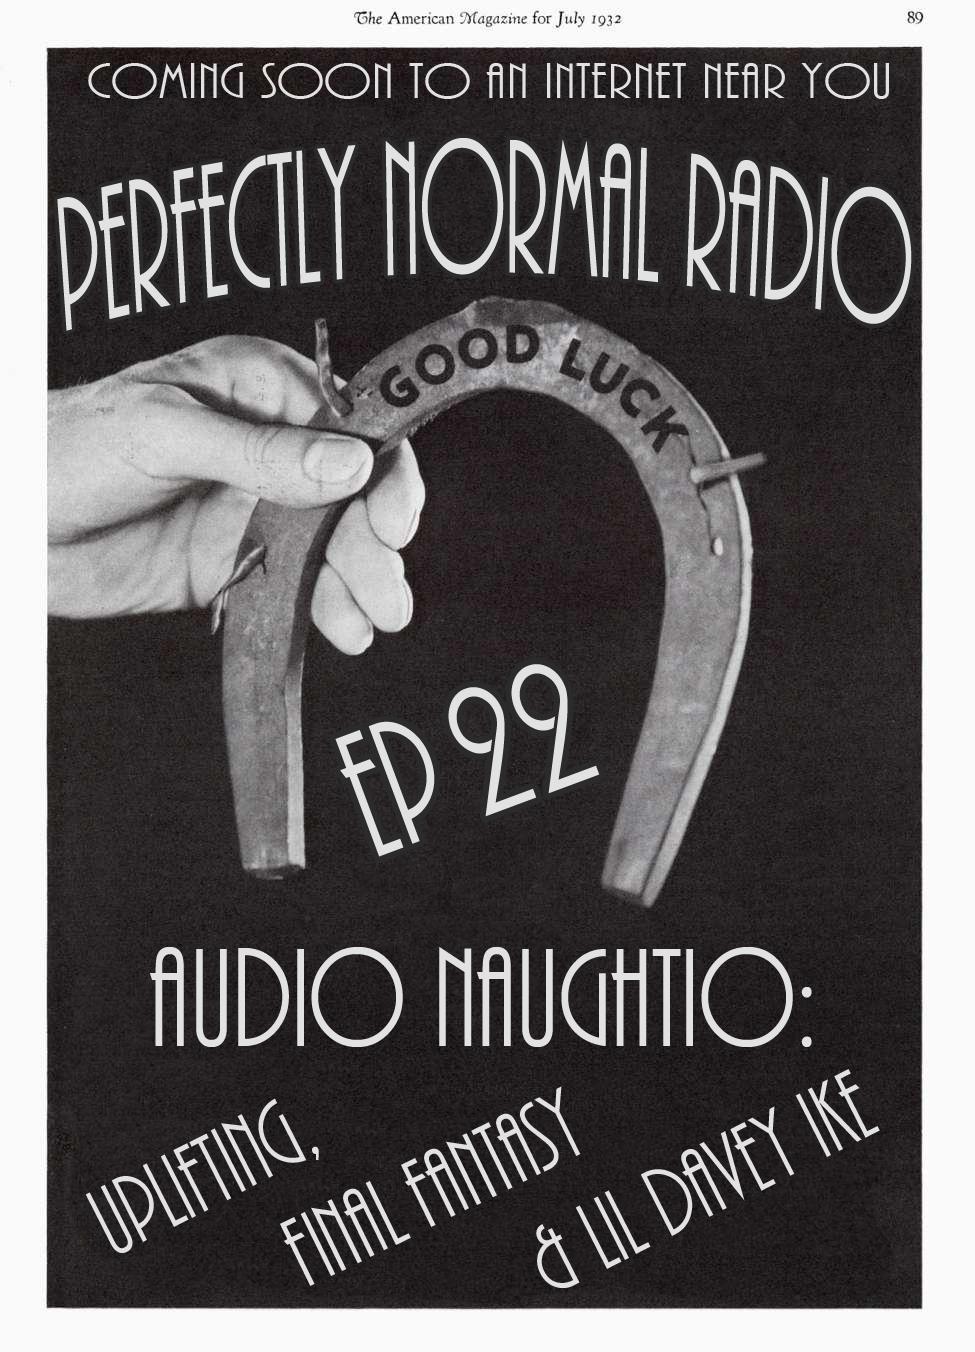 Audio Naughtio Poster.jpg